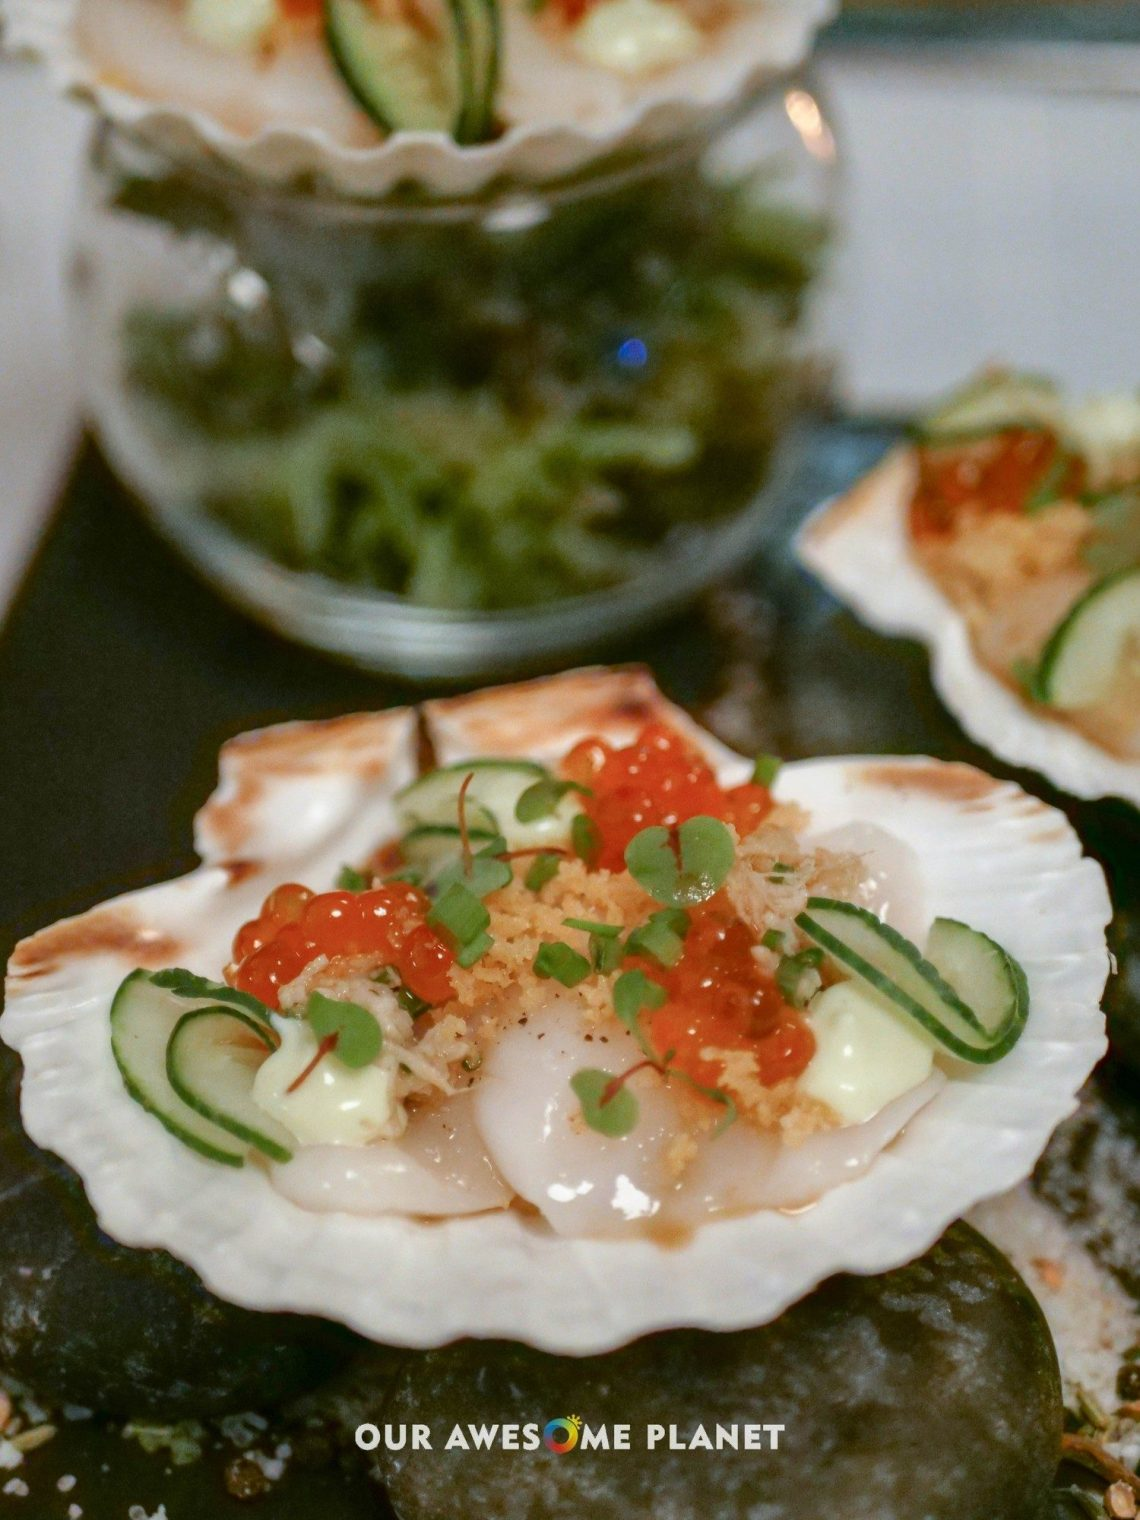 Scallop Ceviche (₱620). Ponzu, ikura, tempura flakes, wasabi mousse